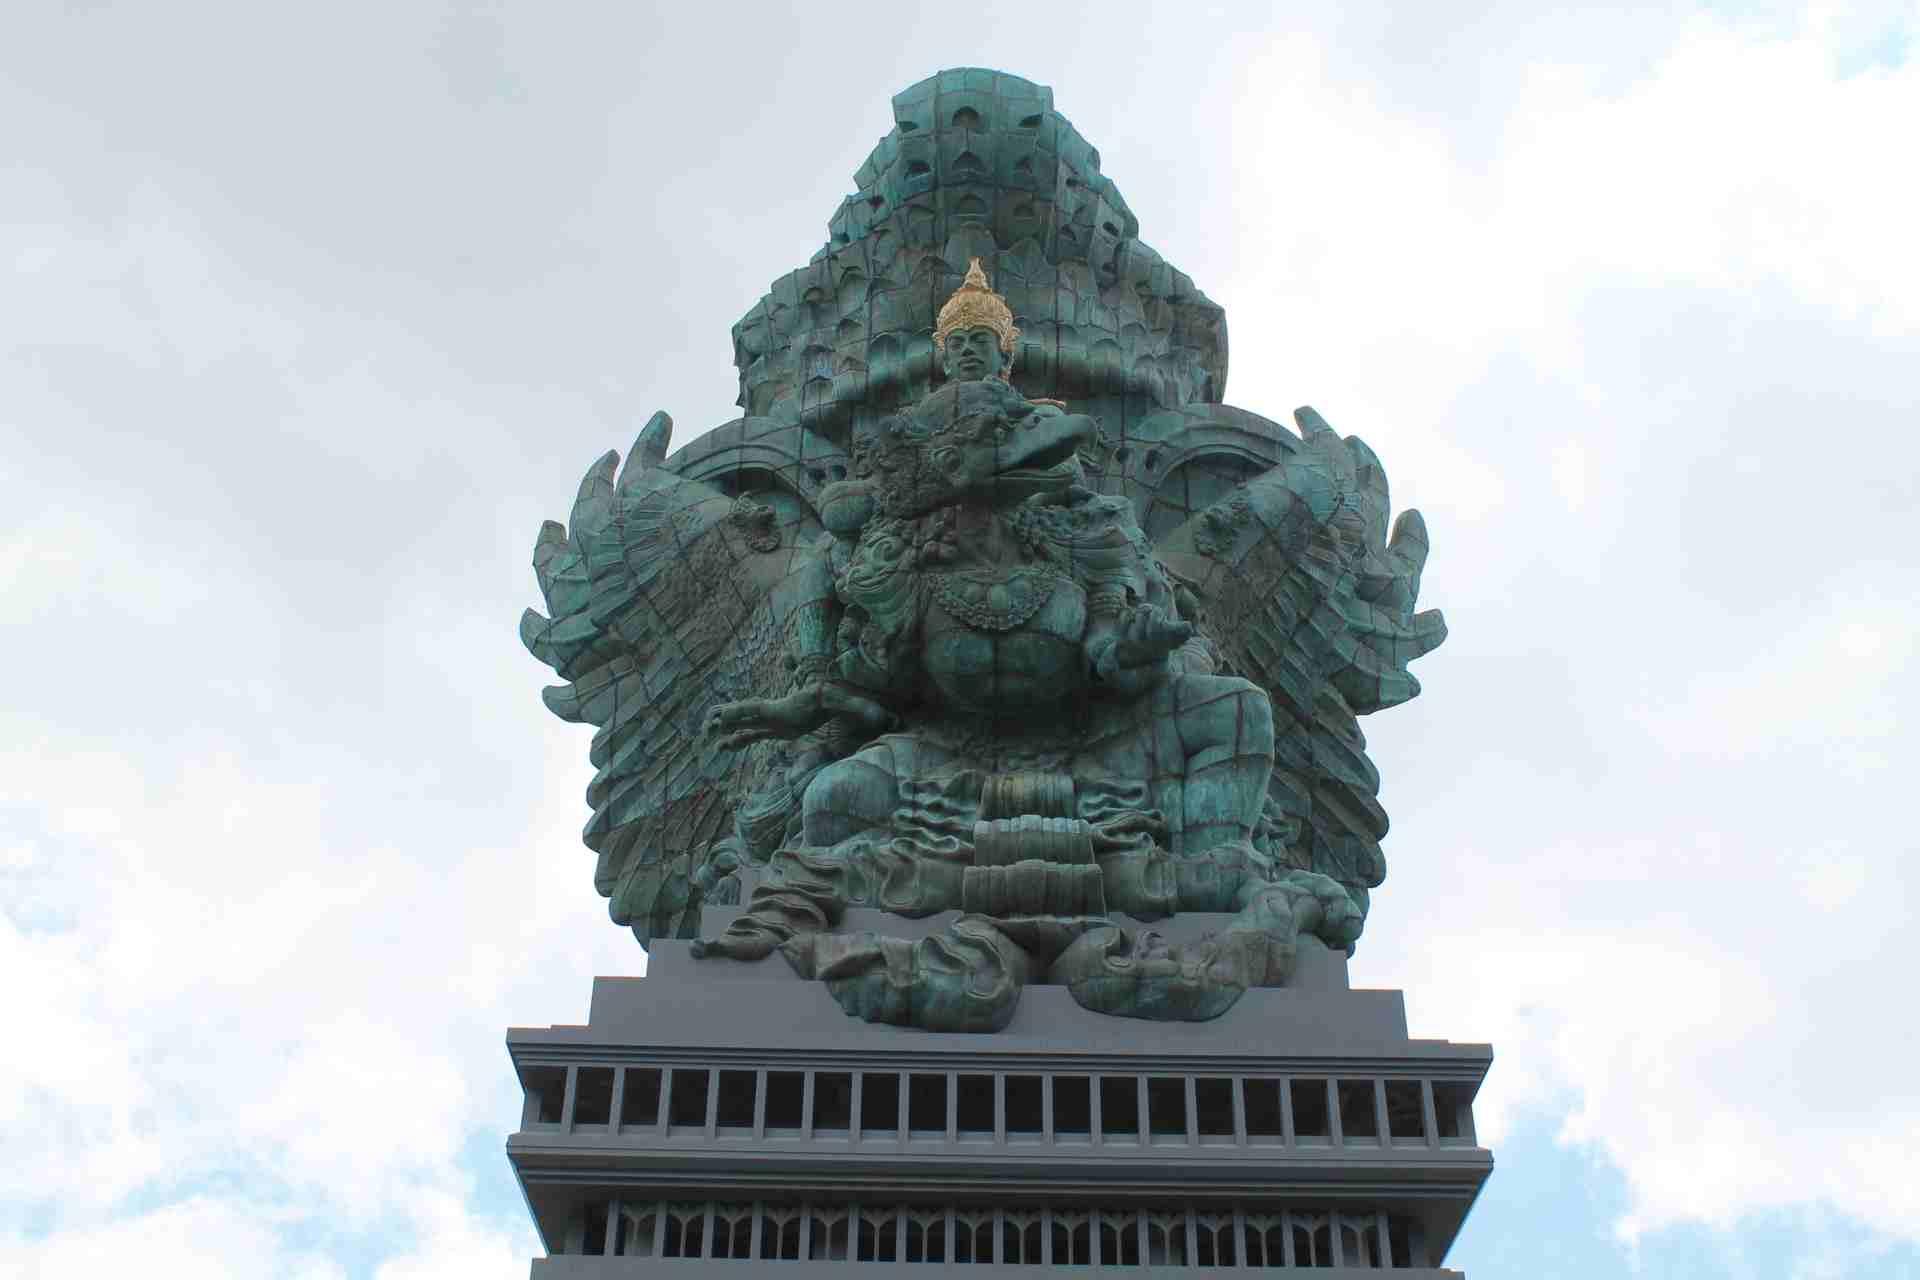 2-garuda-wisnu-kencana-kutlurpark-bali-statue